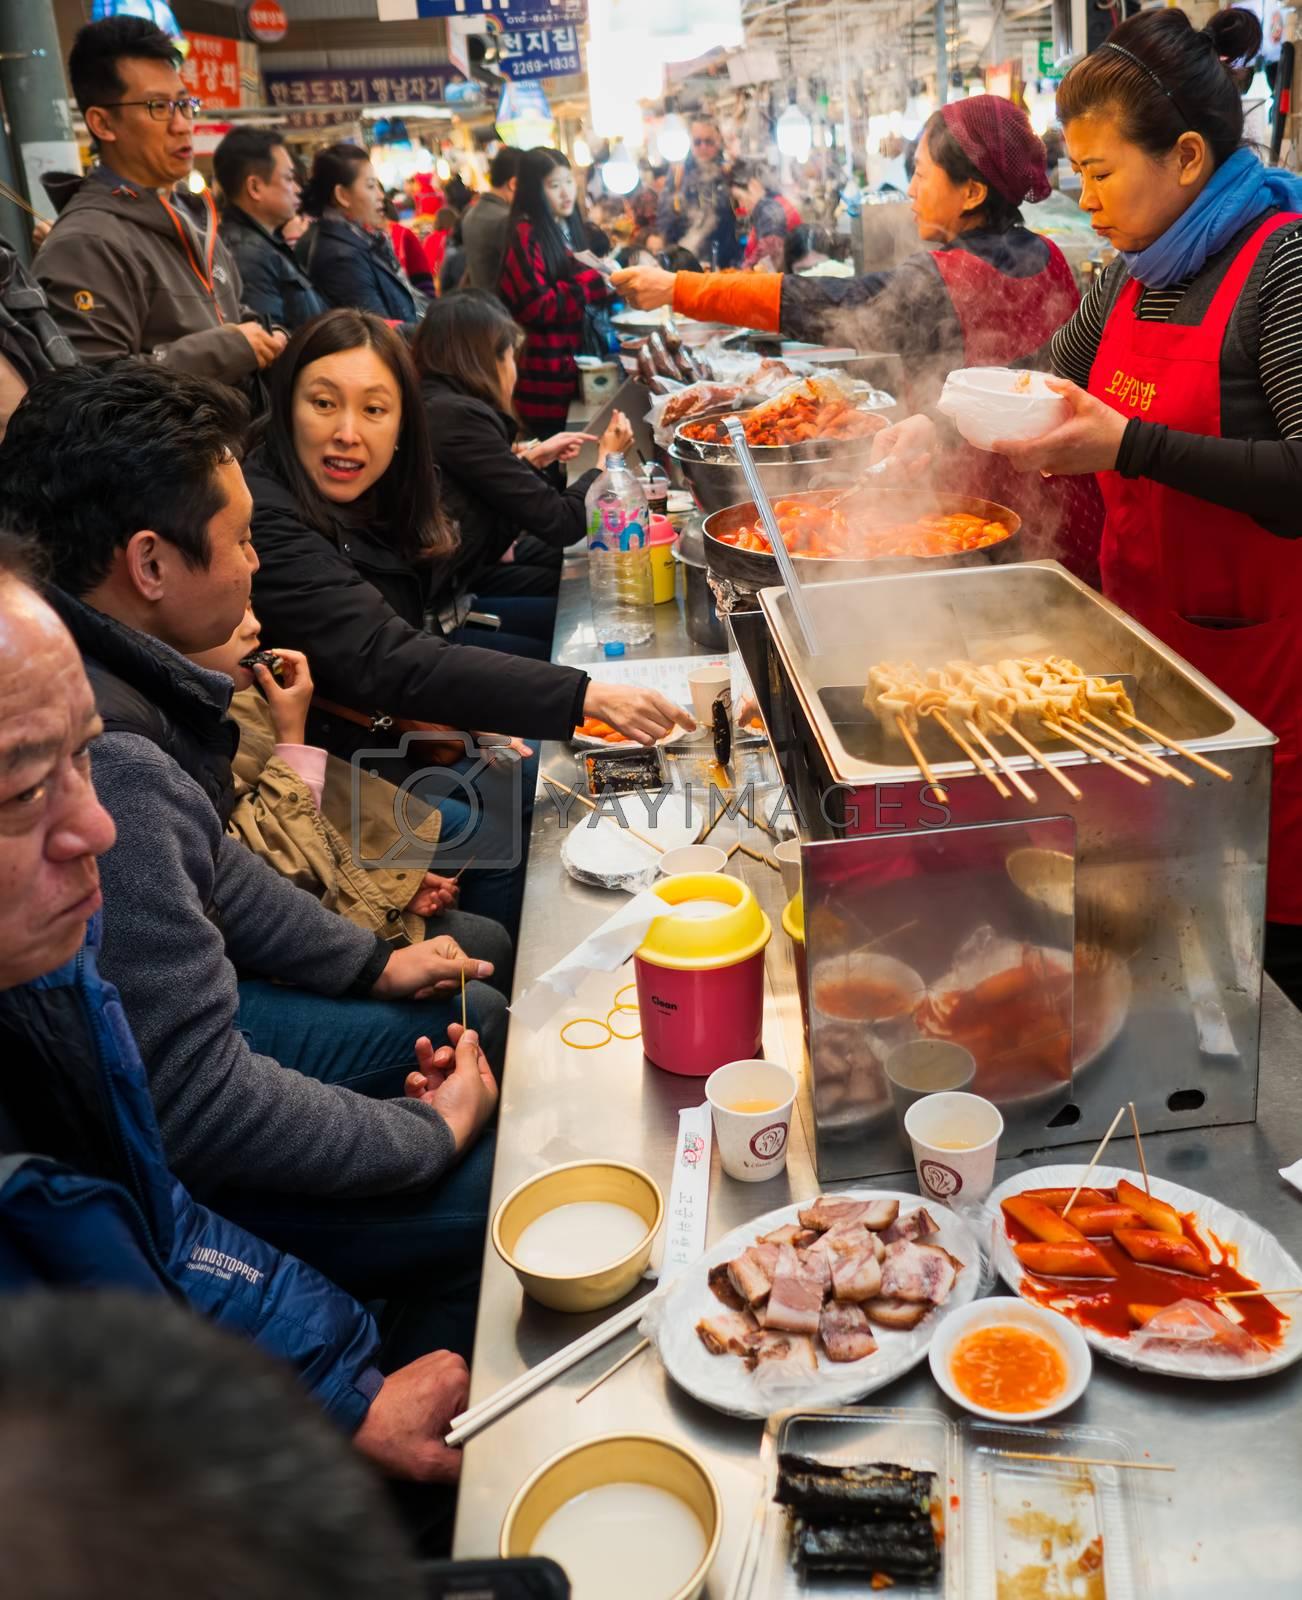 seoul, south korea - 11th november 2017: foodies pack the crowded traditional food street stalls at gwangjang market